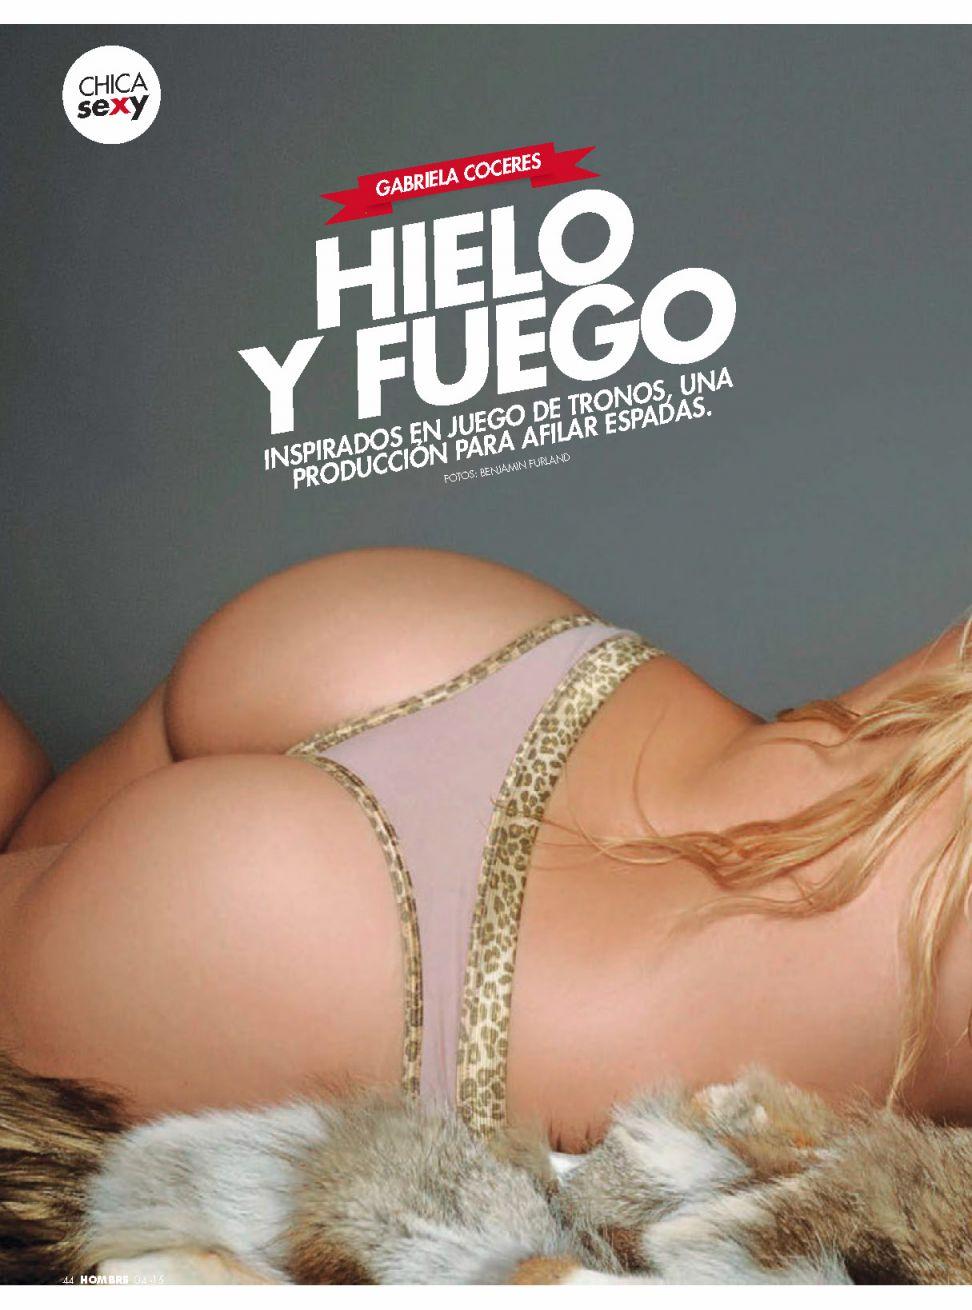 Gabriela Coceres Topless Photos